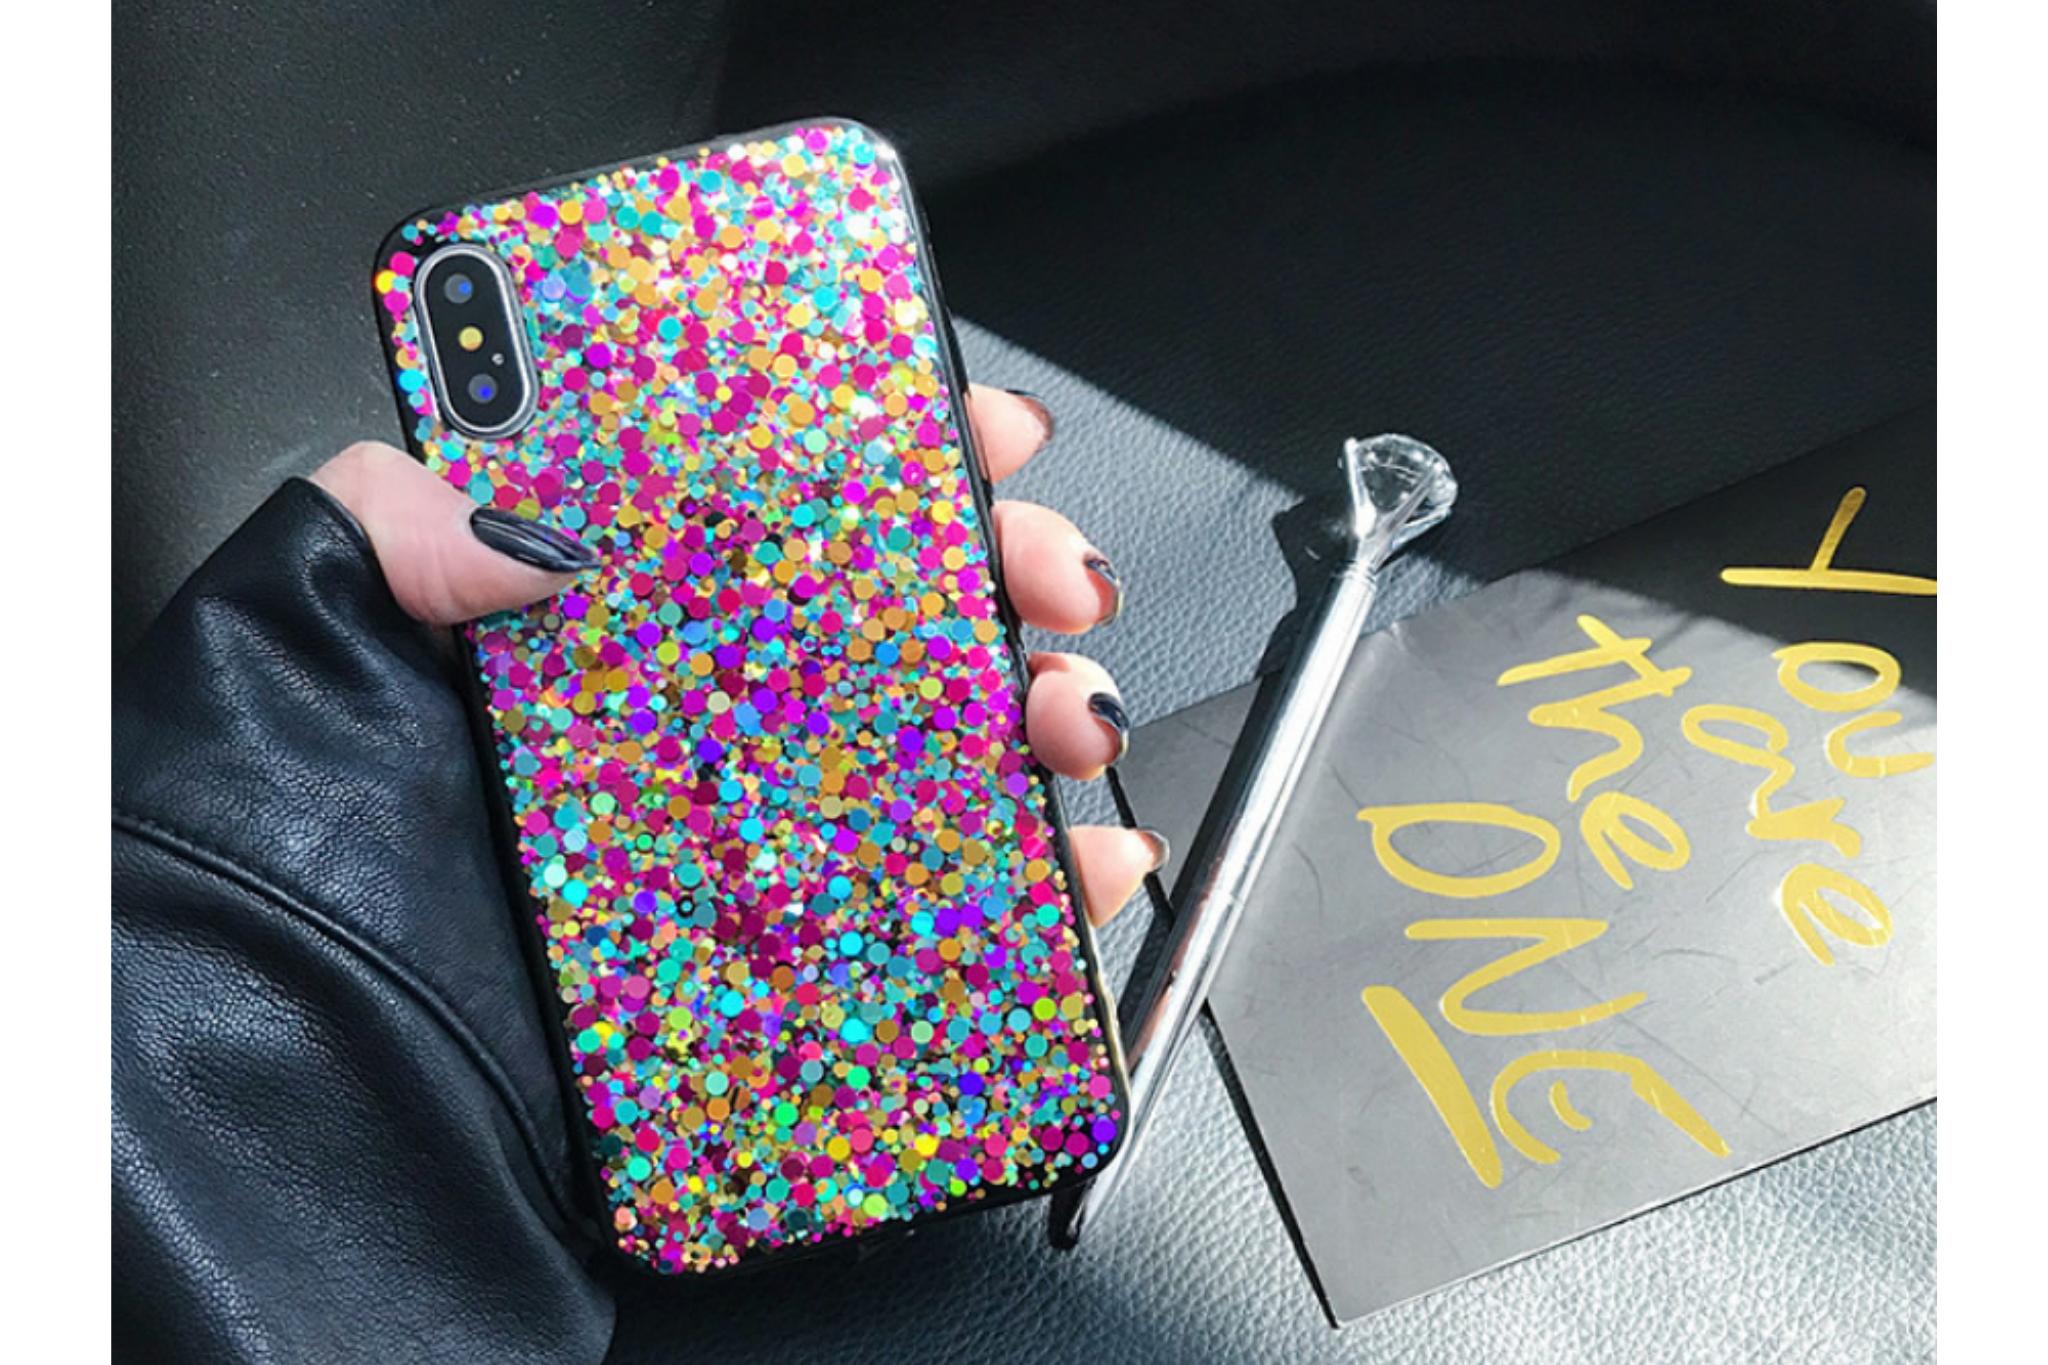 Smartphonehoesje iPhone 6S Plus   Bling met glitters   Multicolor